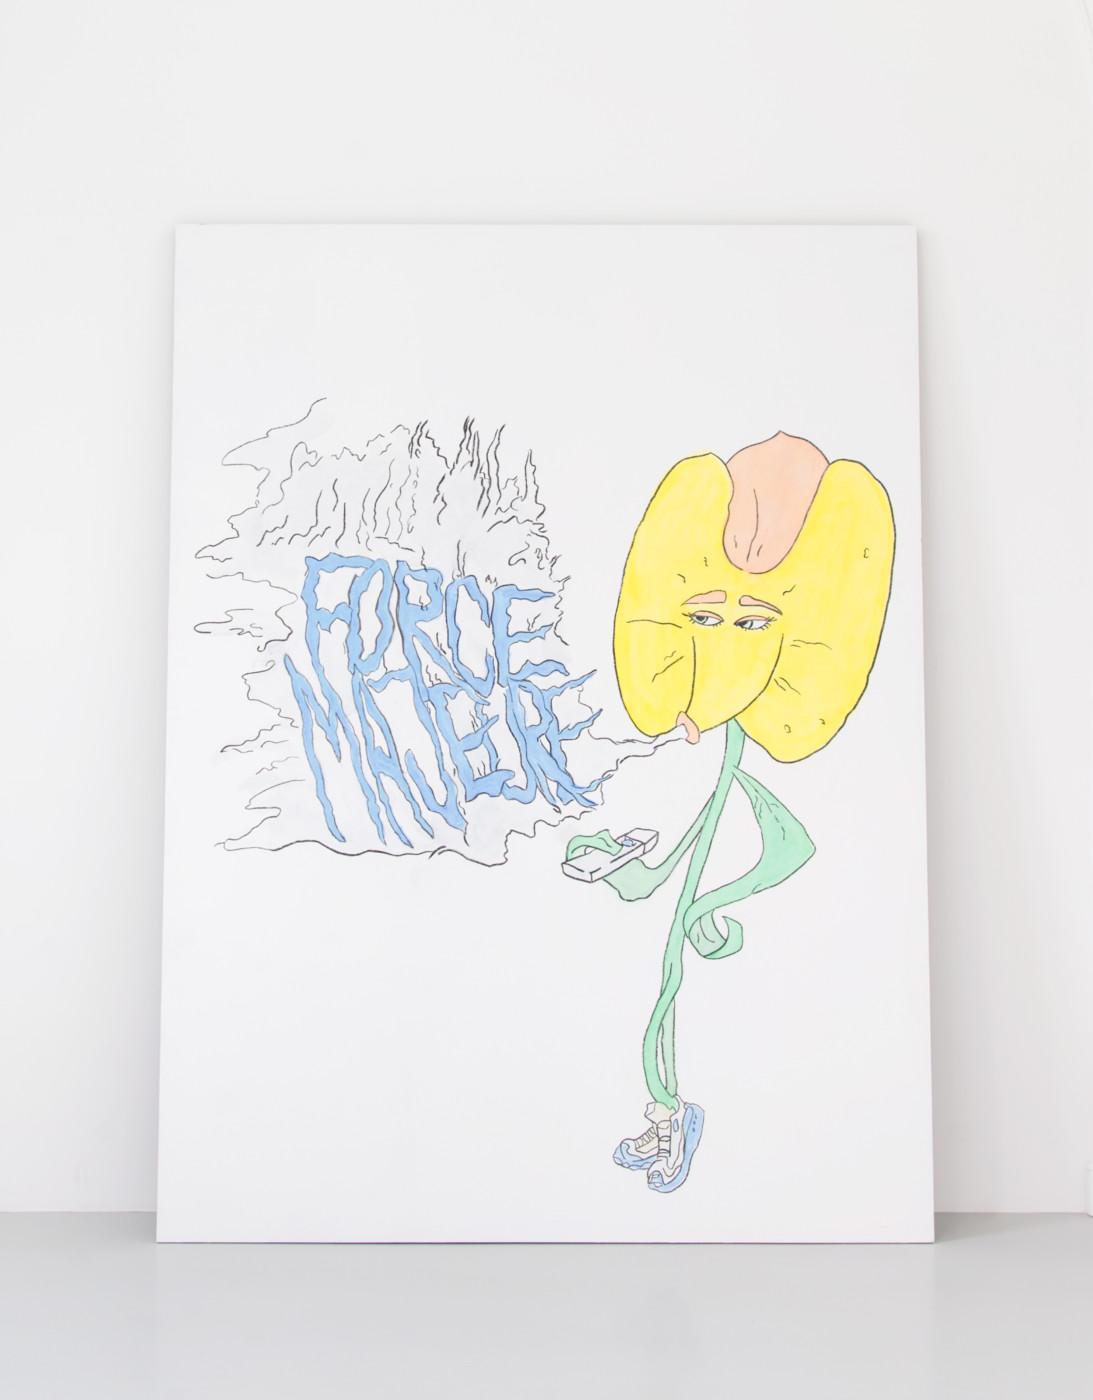 DENA YAGO  Hands Full , 2019 MDF, acrylic, tempera, chalk and charcoal 245 x 185 x 3 cm / 96 1/2 x 72 7/8 x 1 1/8 in - High Art Gallery Paris